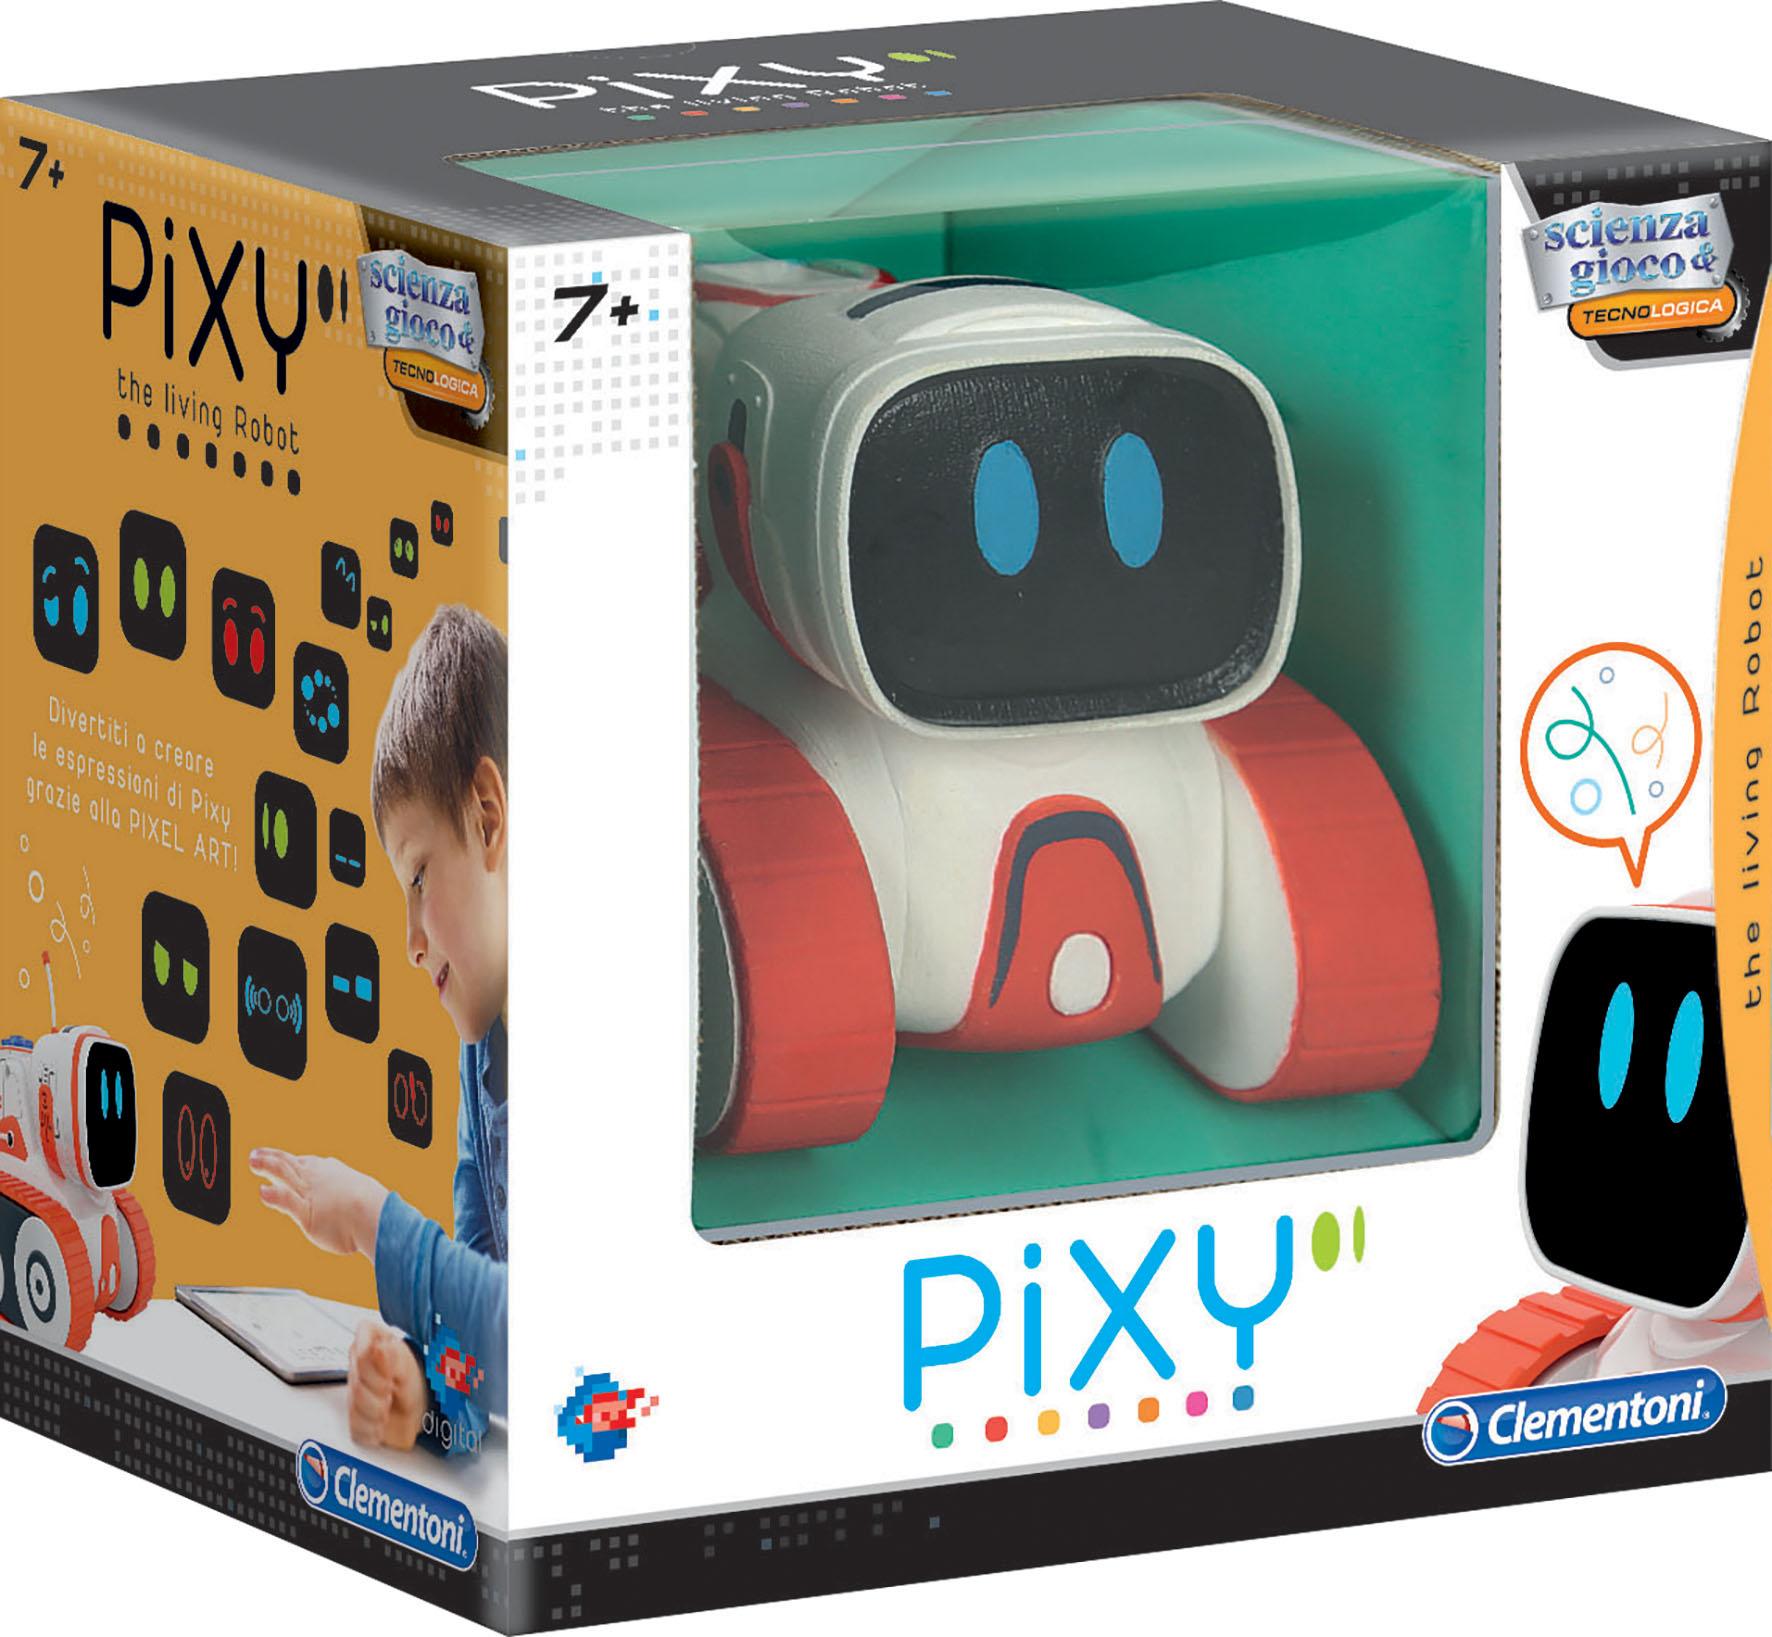 PIXY THE LIVING ROBOT TV